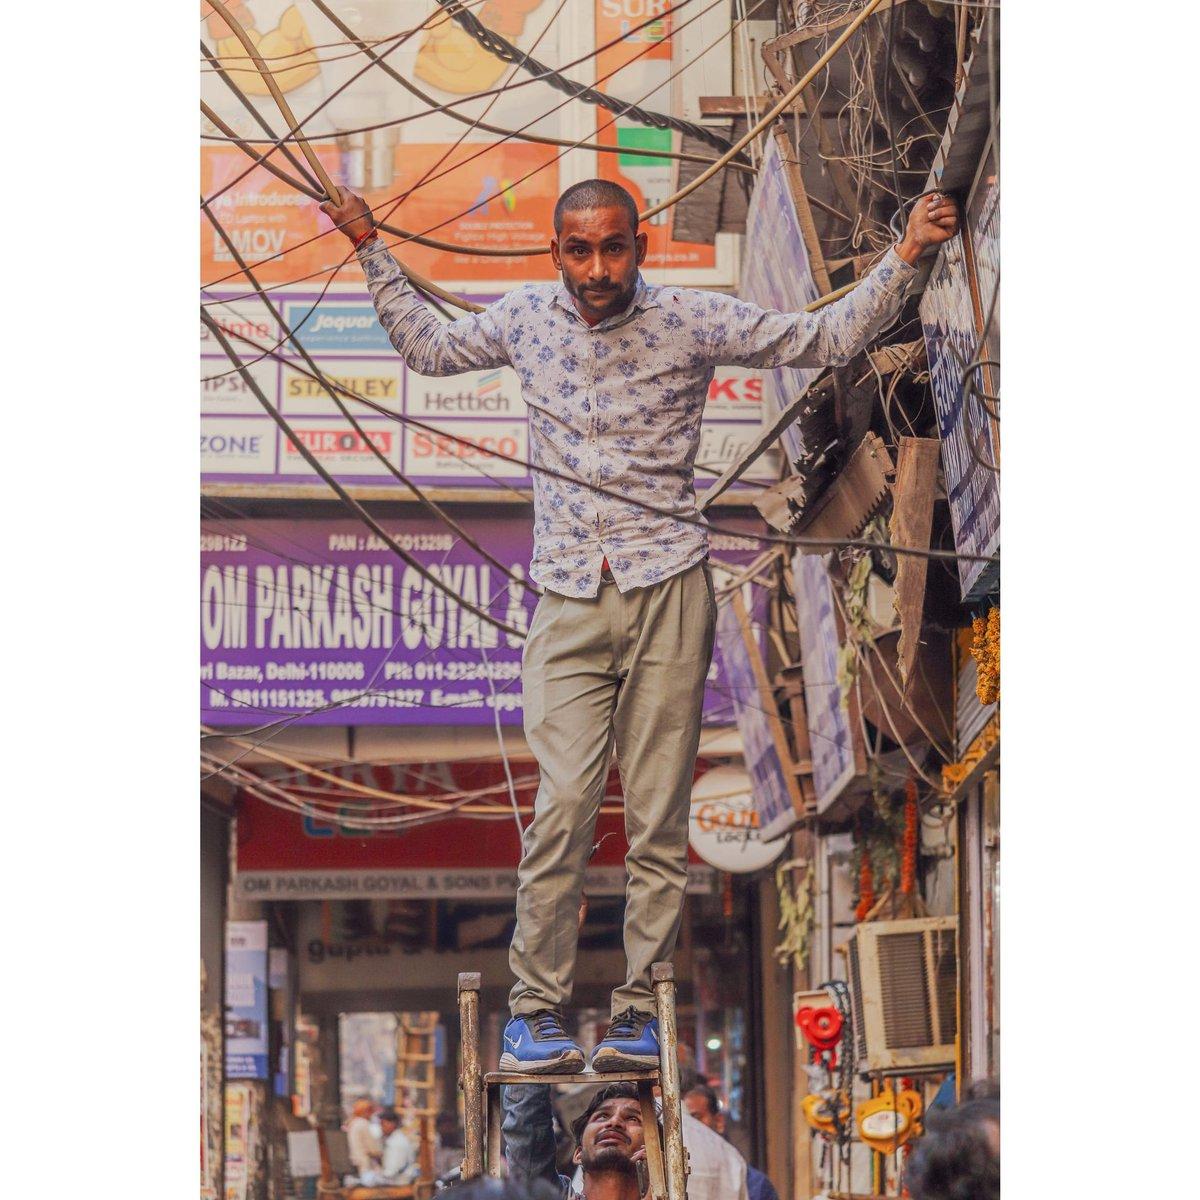 A man stand in a ladder in hold the electric Cable. . . #chawribazar #delhi (2018) . #streetmagazine #streetmobs#peopleinsquare#moodygrams#illgrammers#instamagazine#twgrammers #dipanshukumarstudio #HISTORYTV18 #natgeo #natgeotravel #SteveMcCurry  #yourshotphotographerpic.twitter.com/S8FTtUwjXG